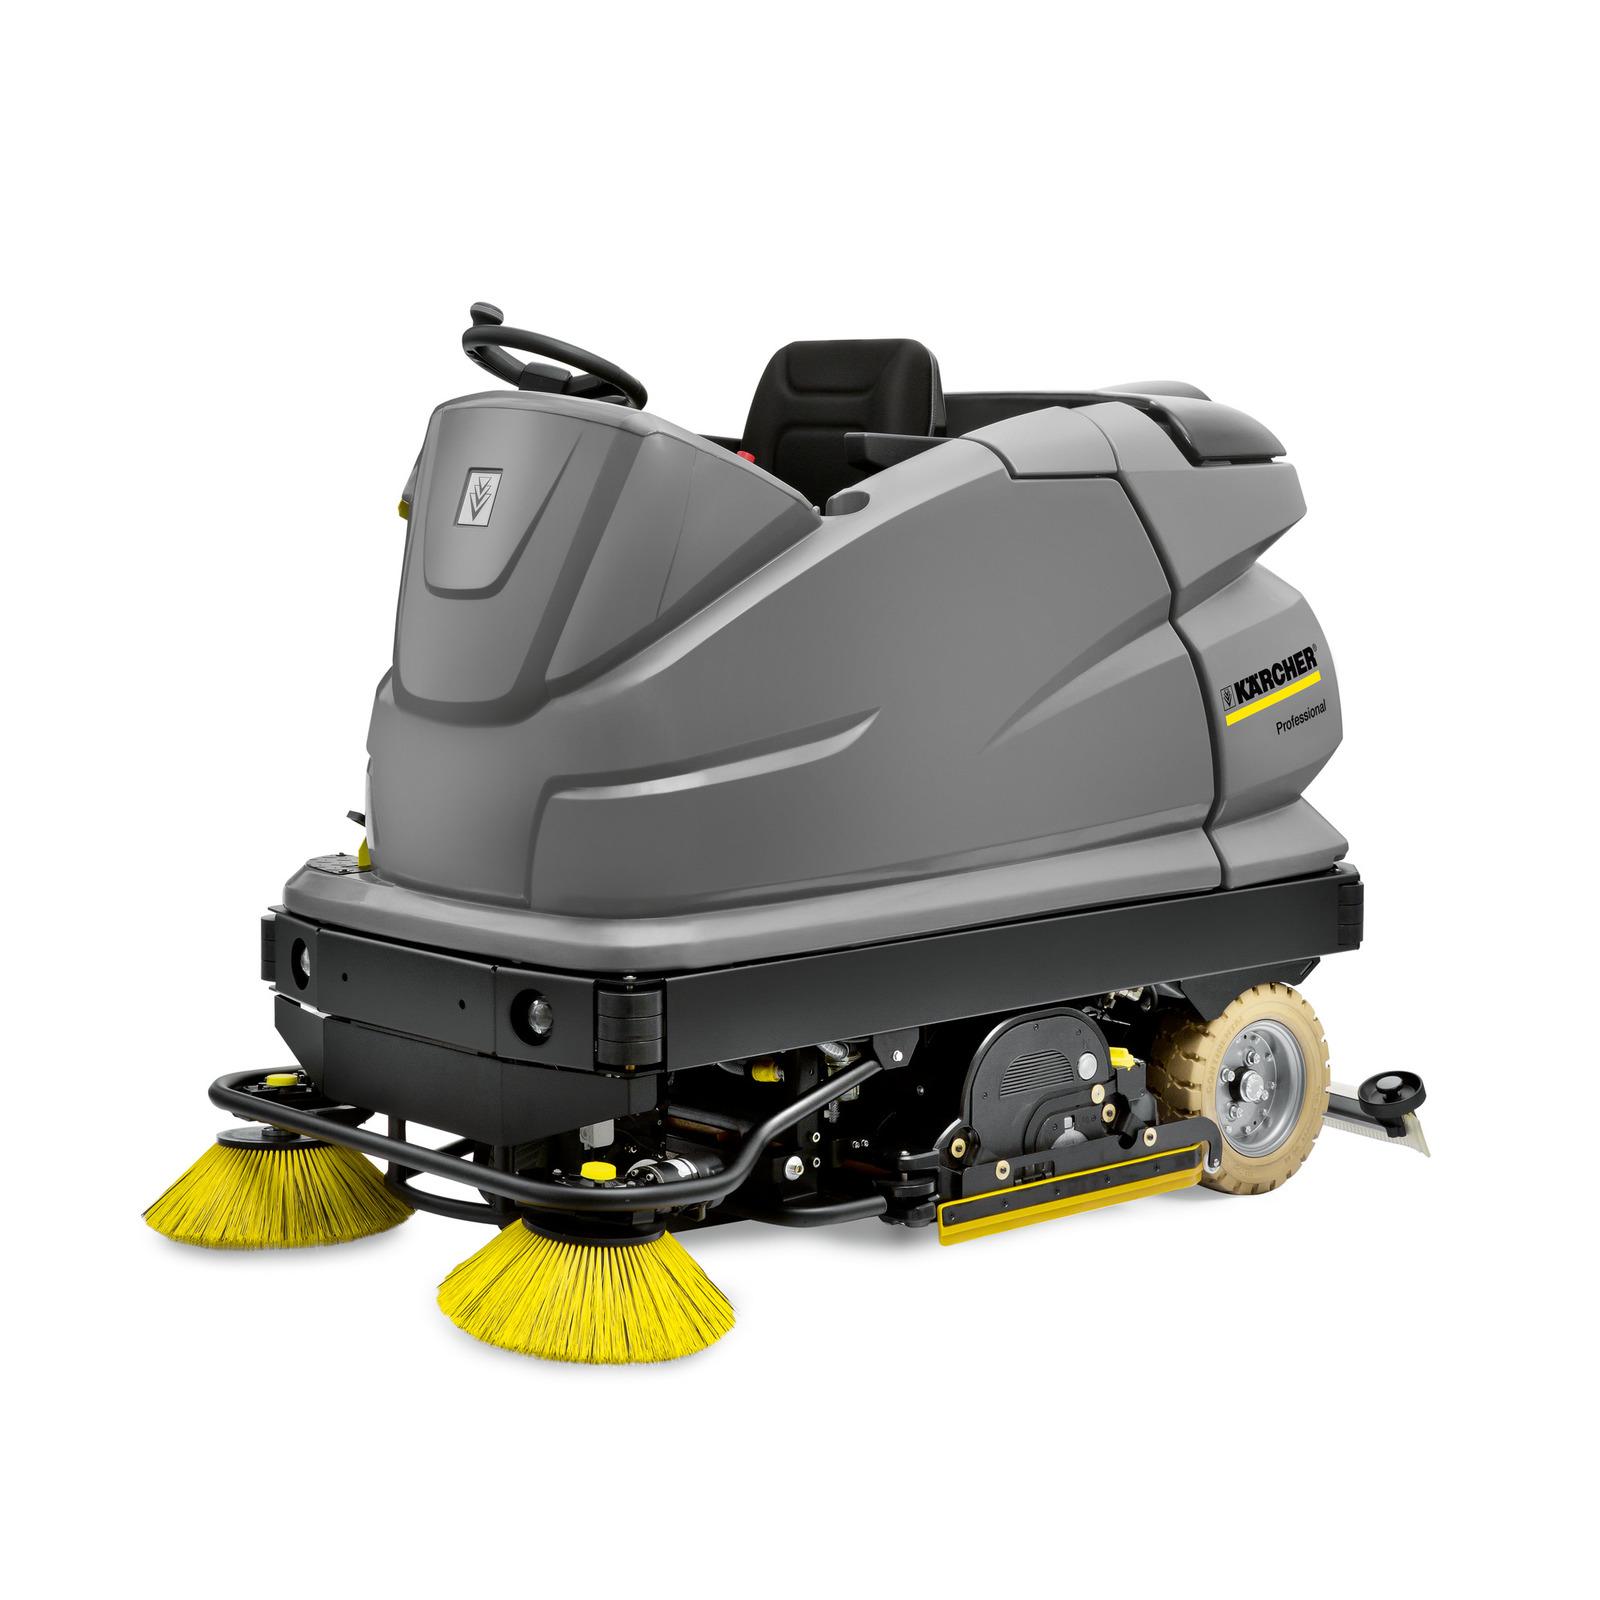 B R RideOn Floor Scrubber Kärcher - Used riding floor scrubber for sale